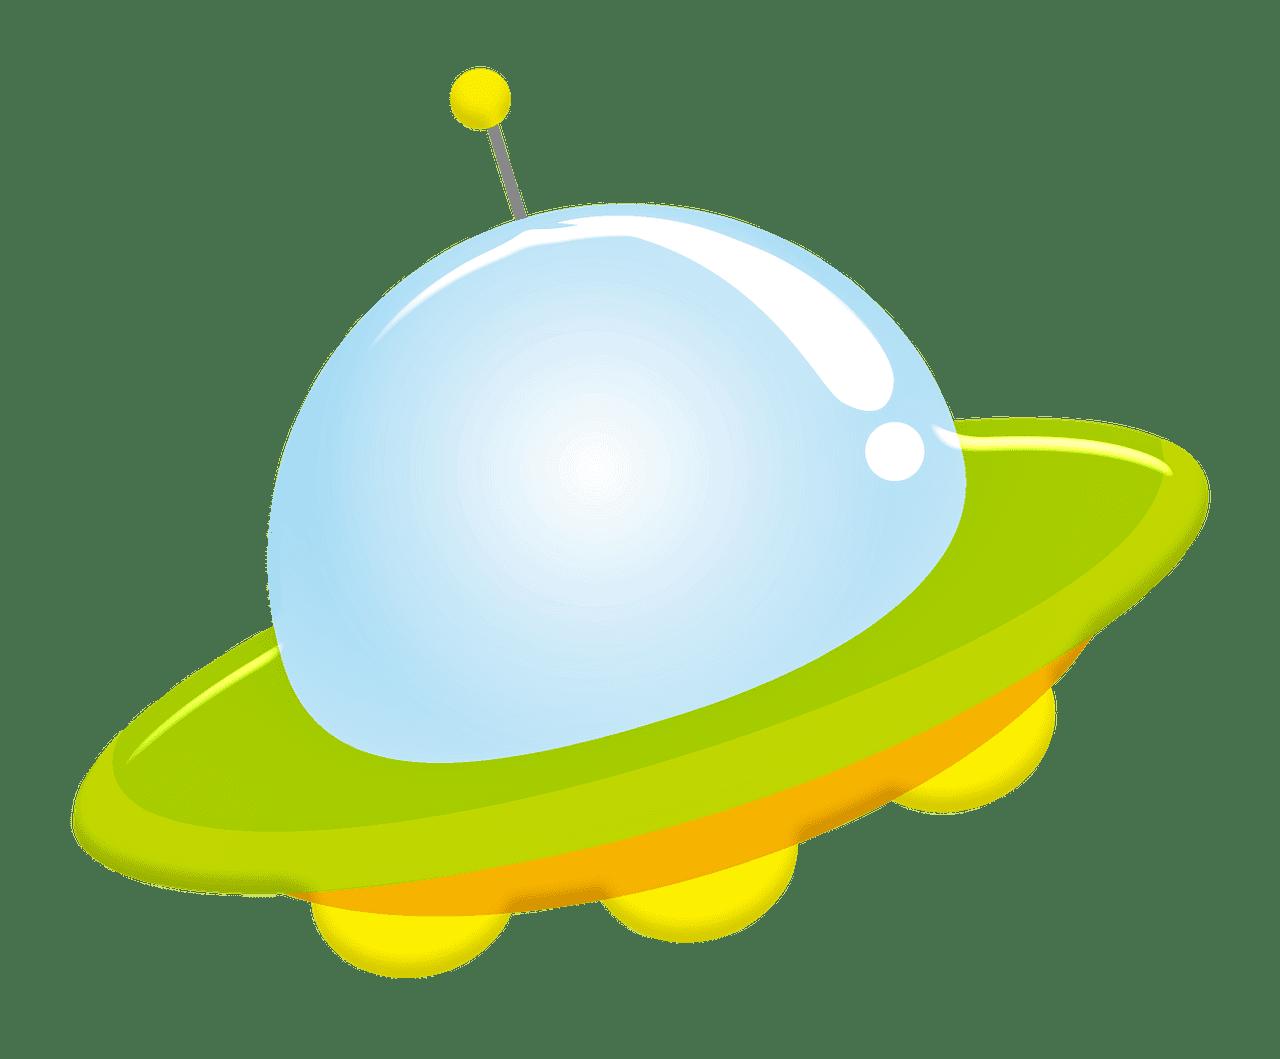 UFO clipart transparent background 5